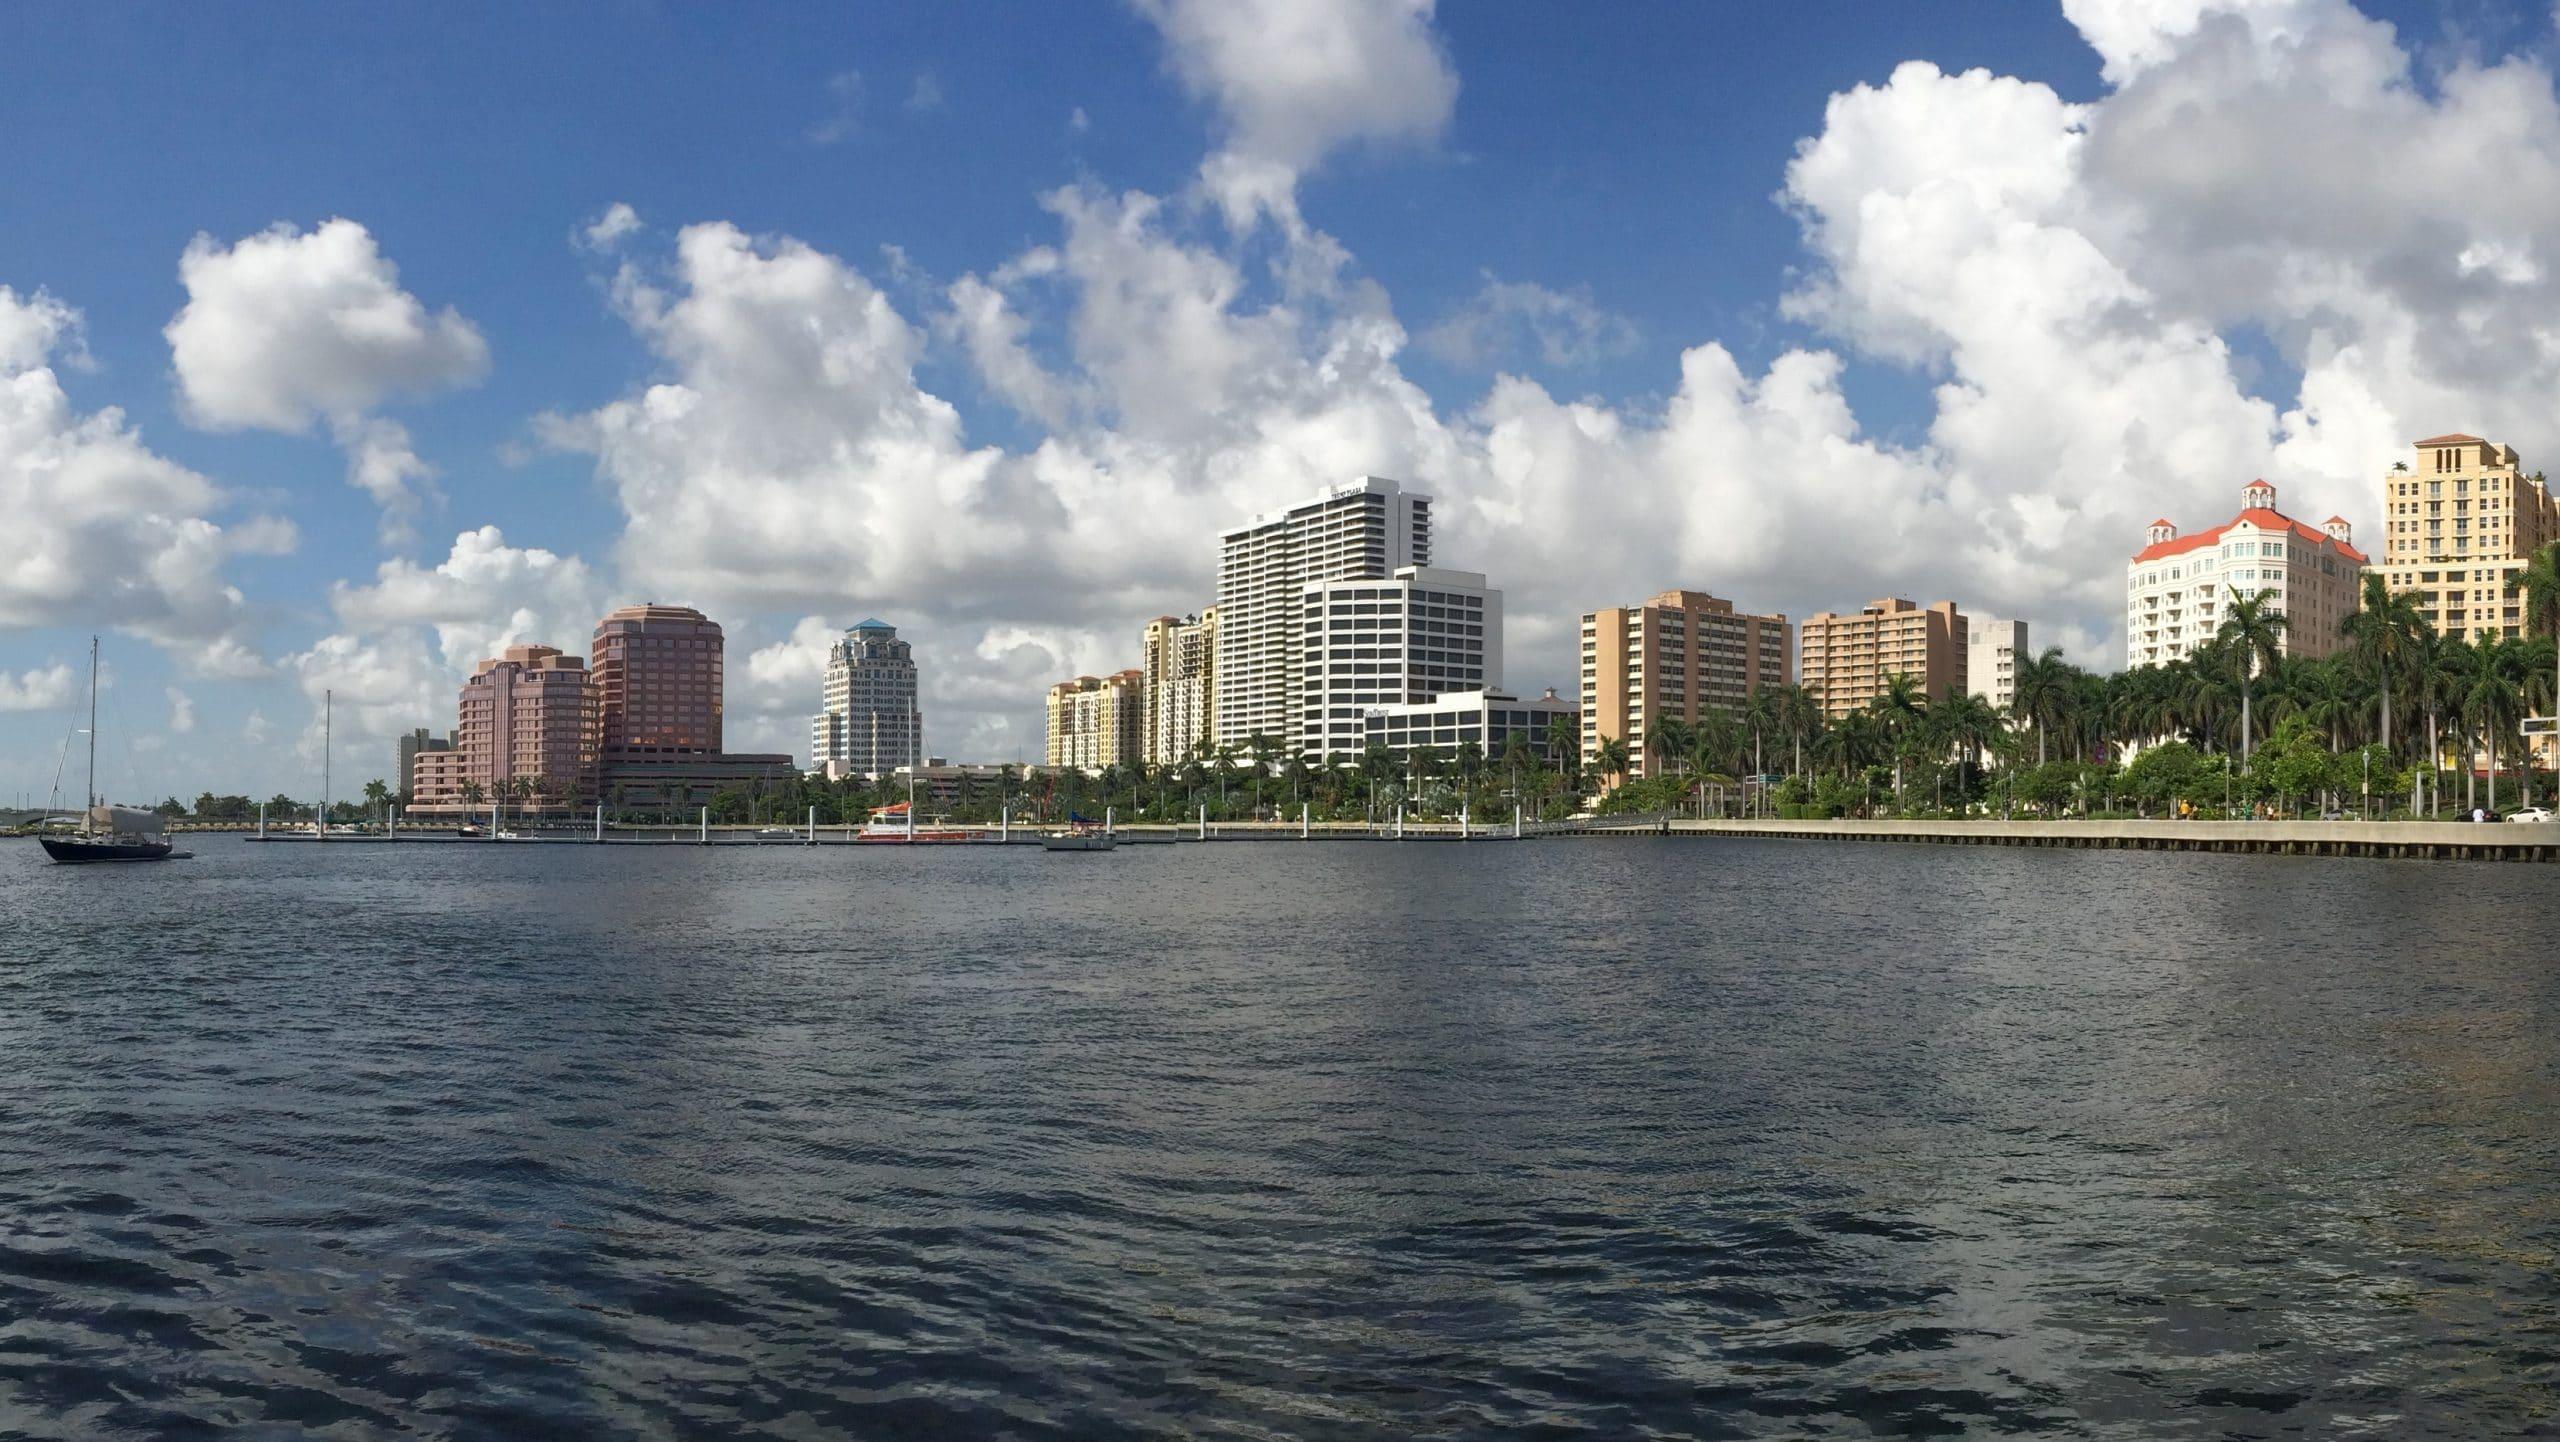 Downtown Skyline and Intracoastal Waterway